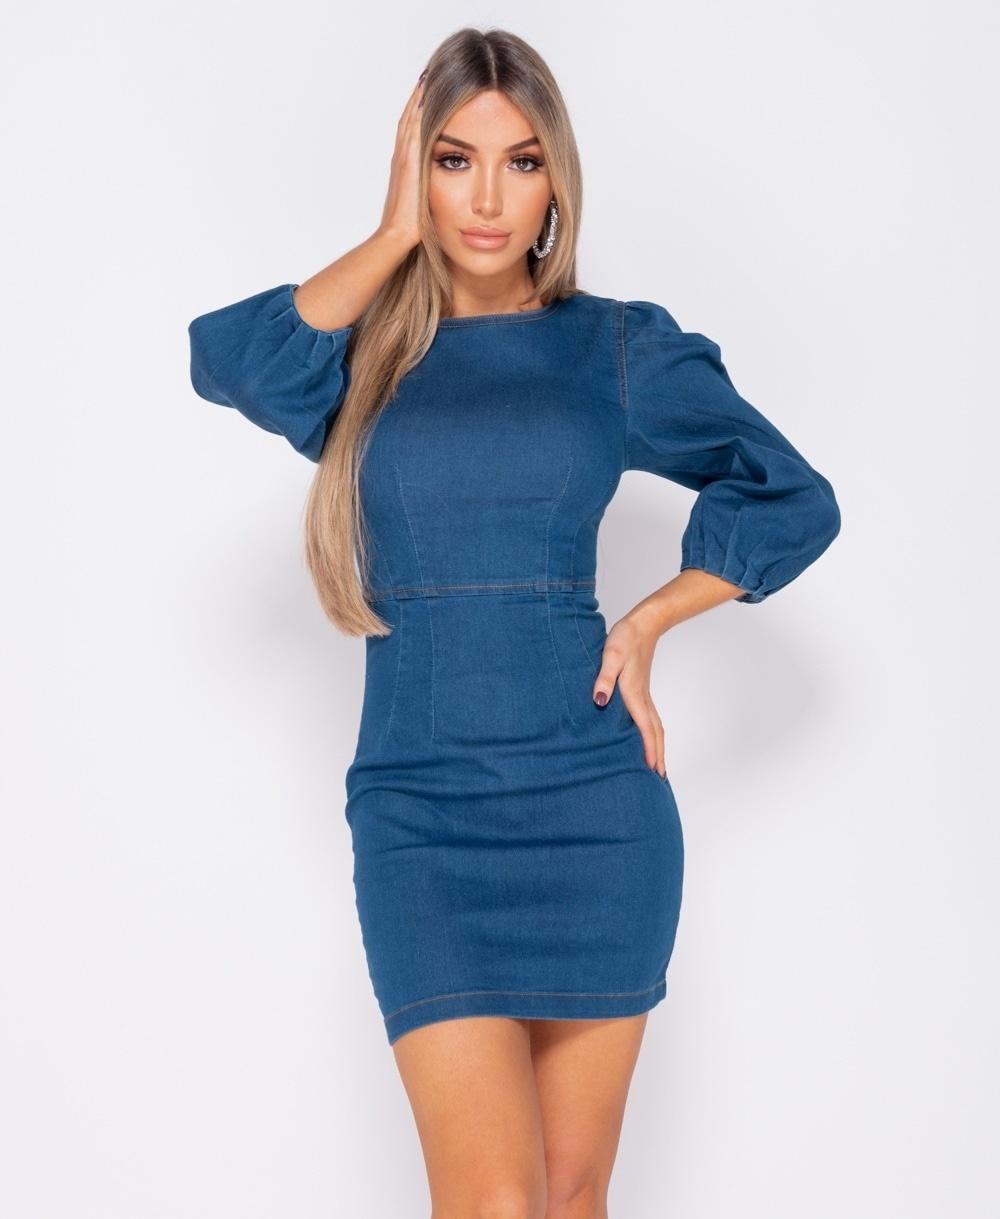 Puffärmel Denim, figurbetontes Kleid - Frauen - Blau - Styleitaly.de